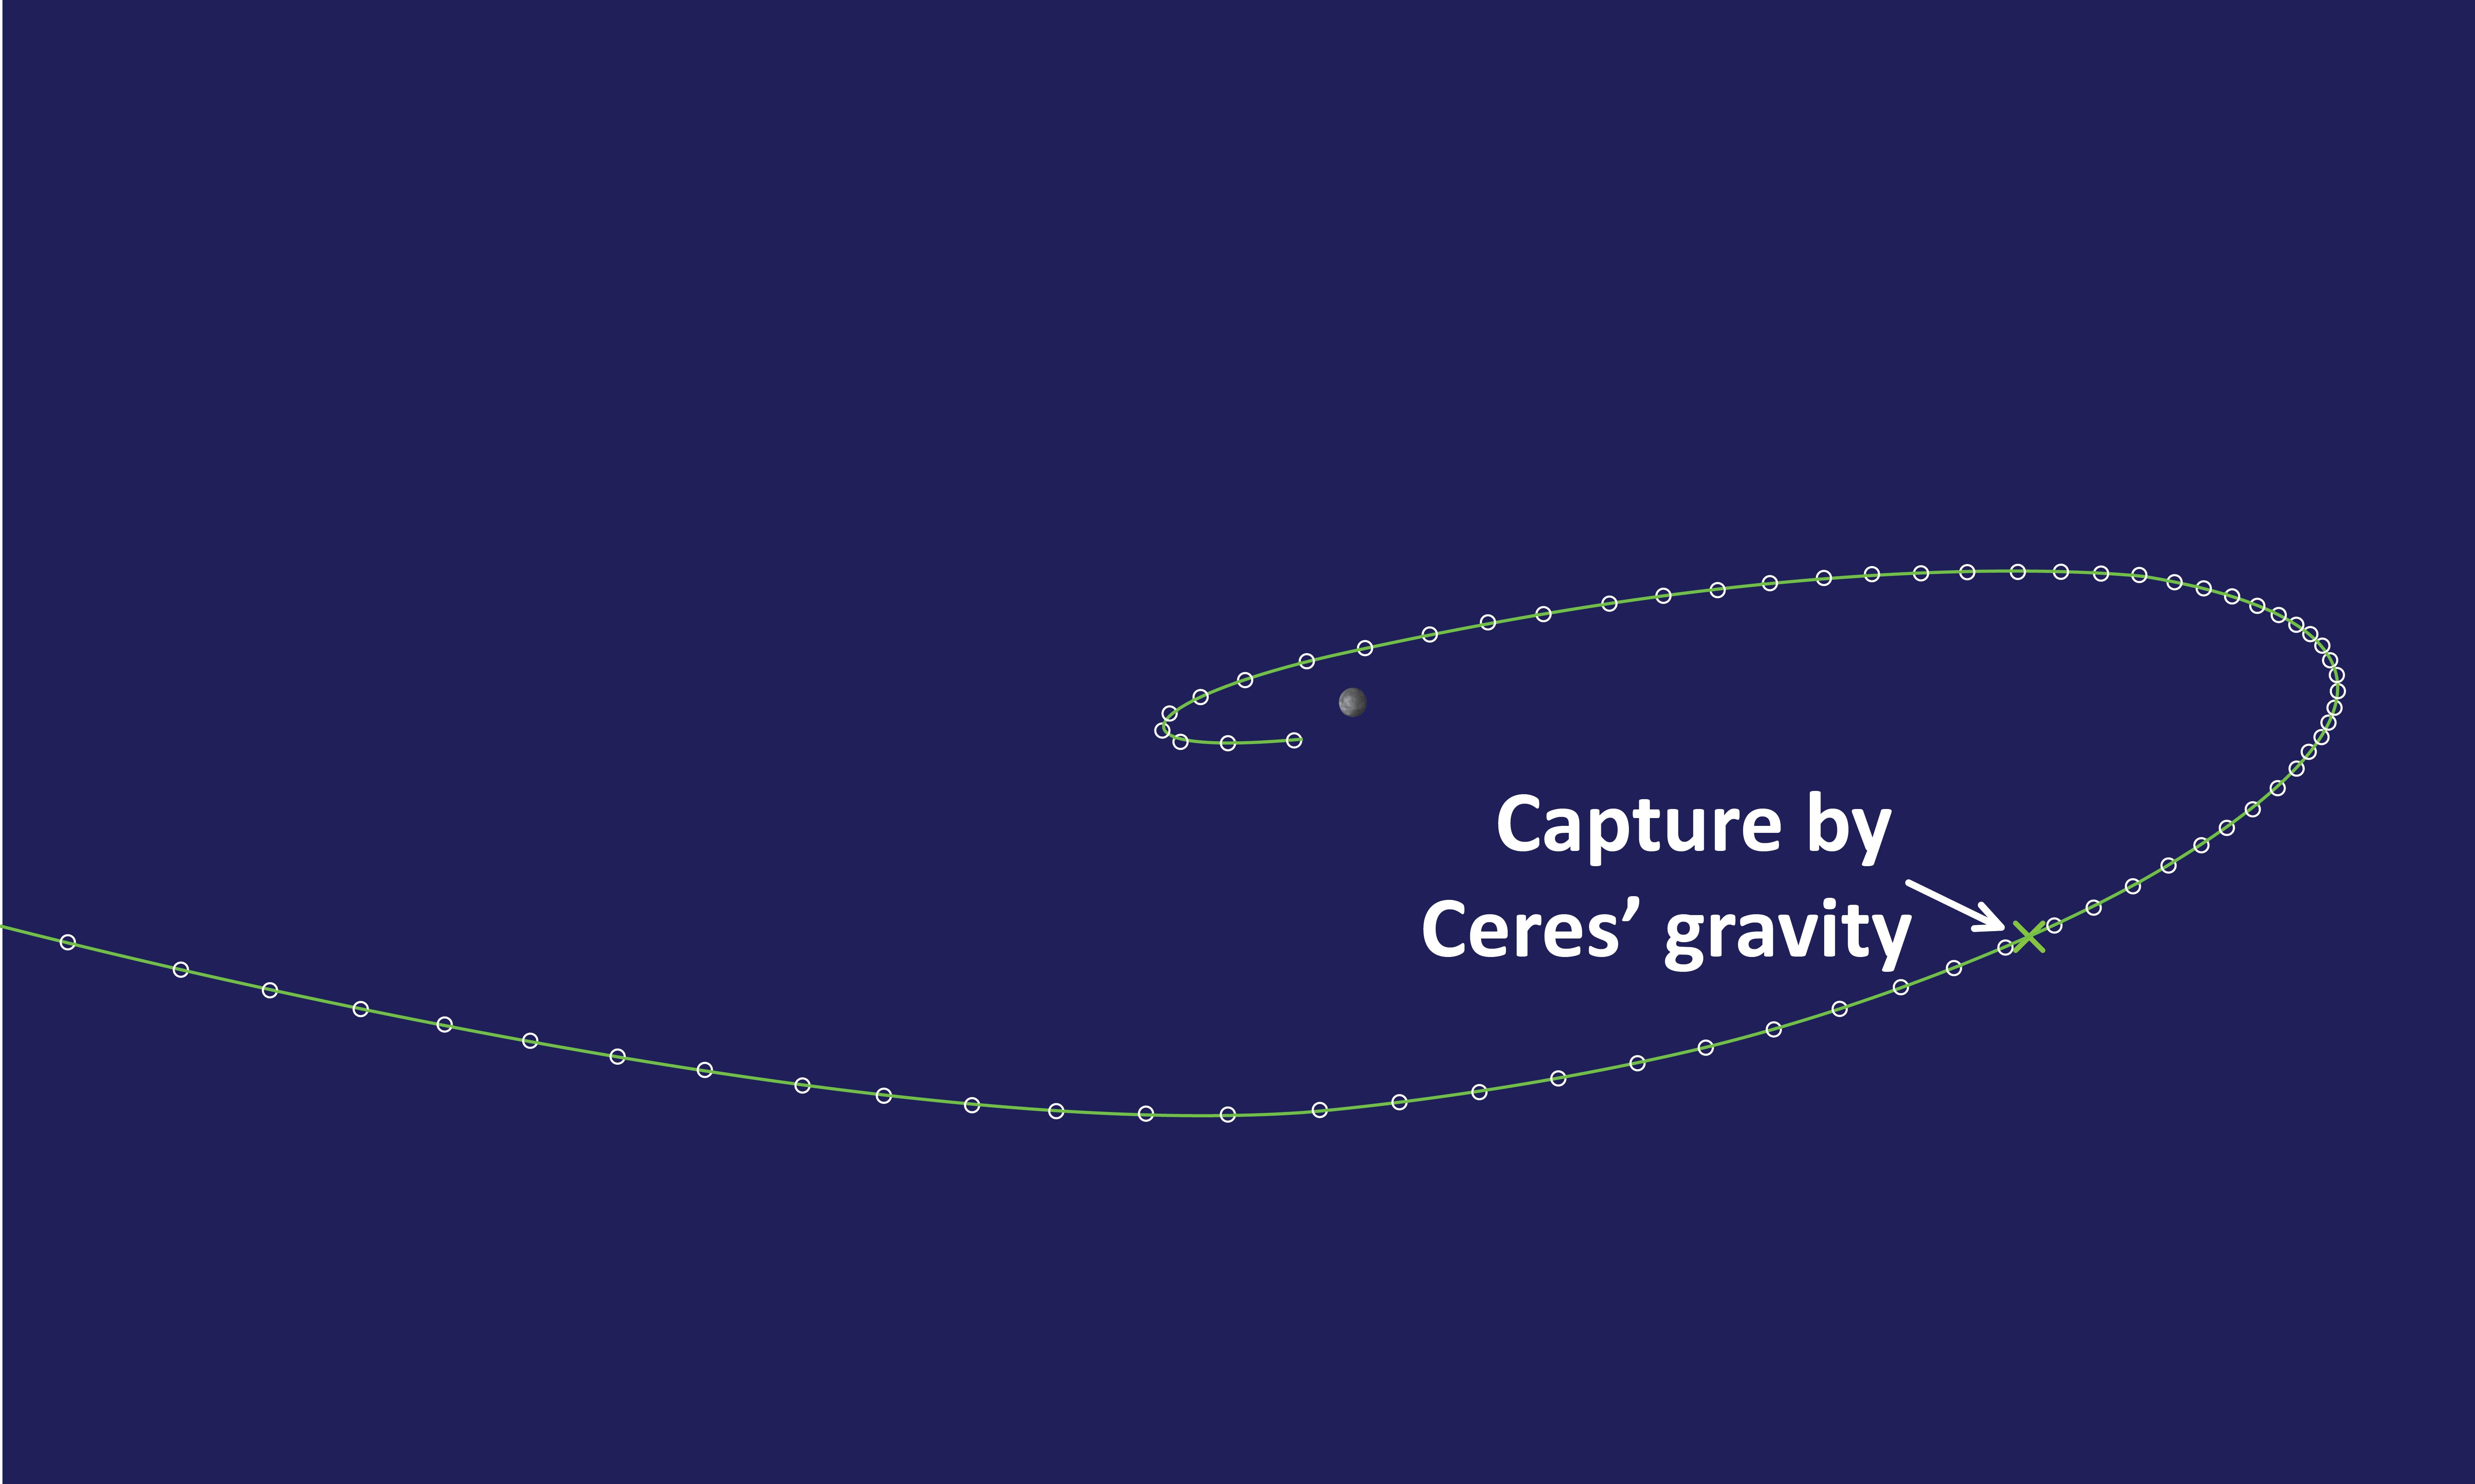 trajectory_20150131